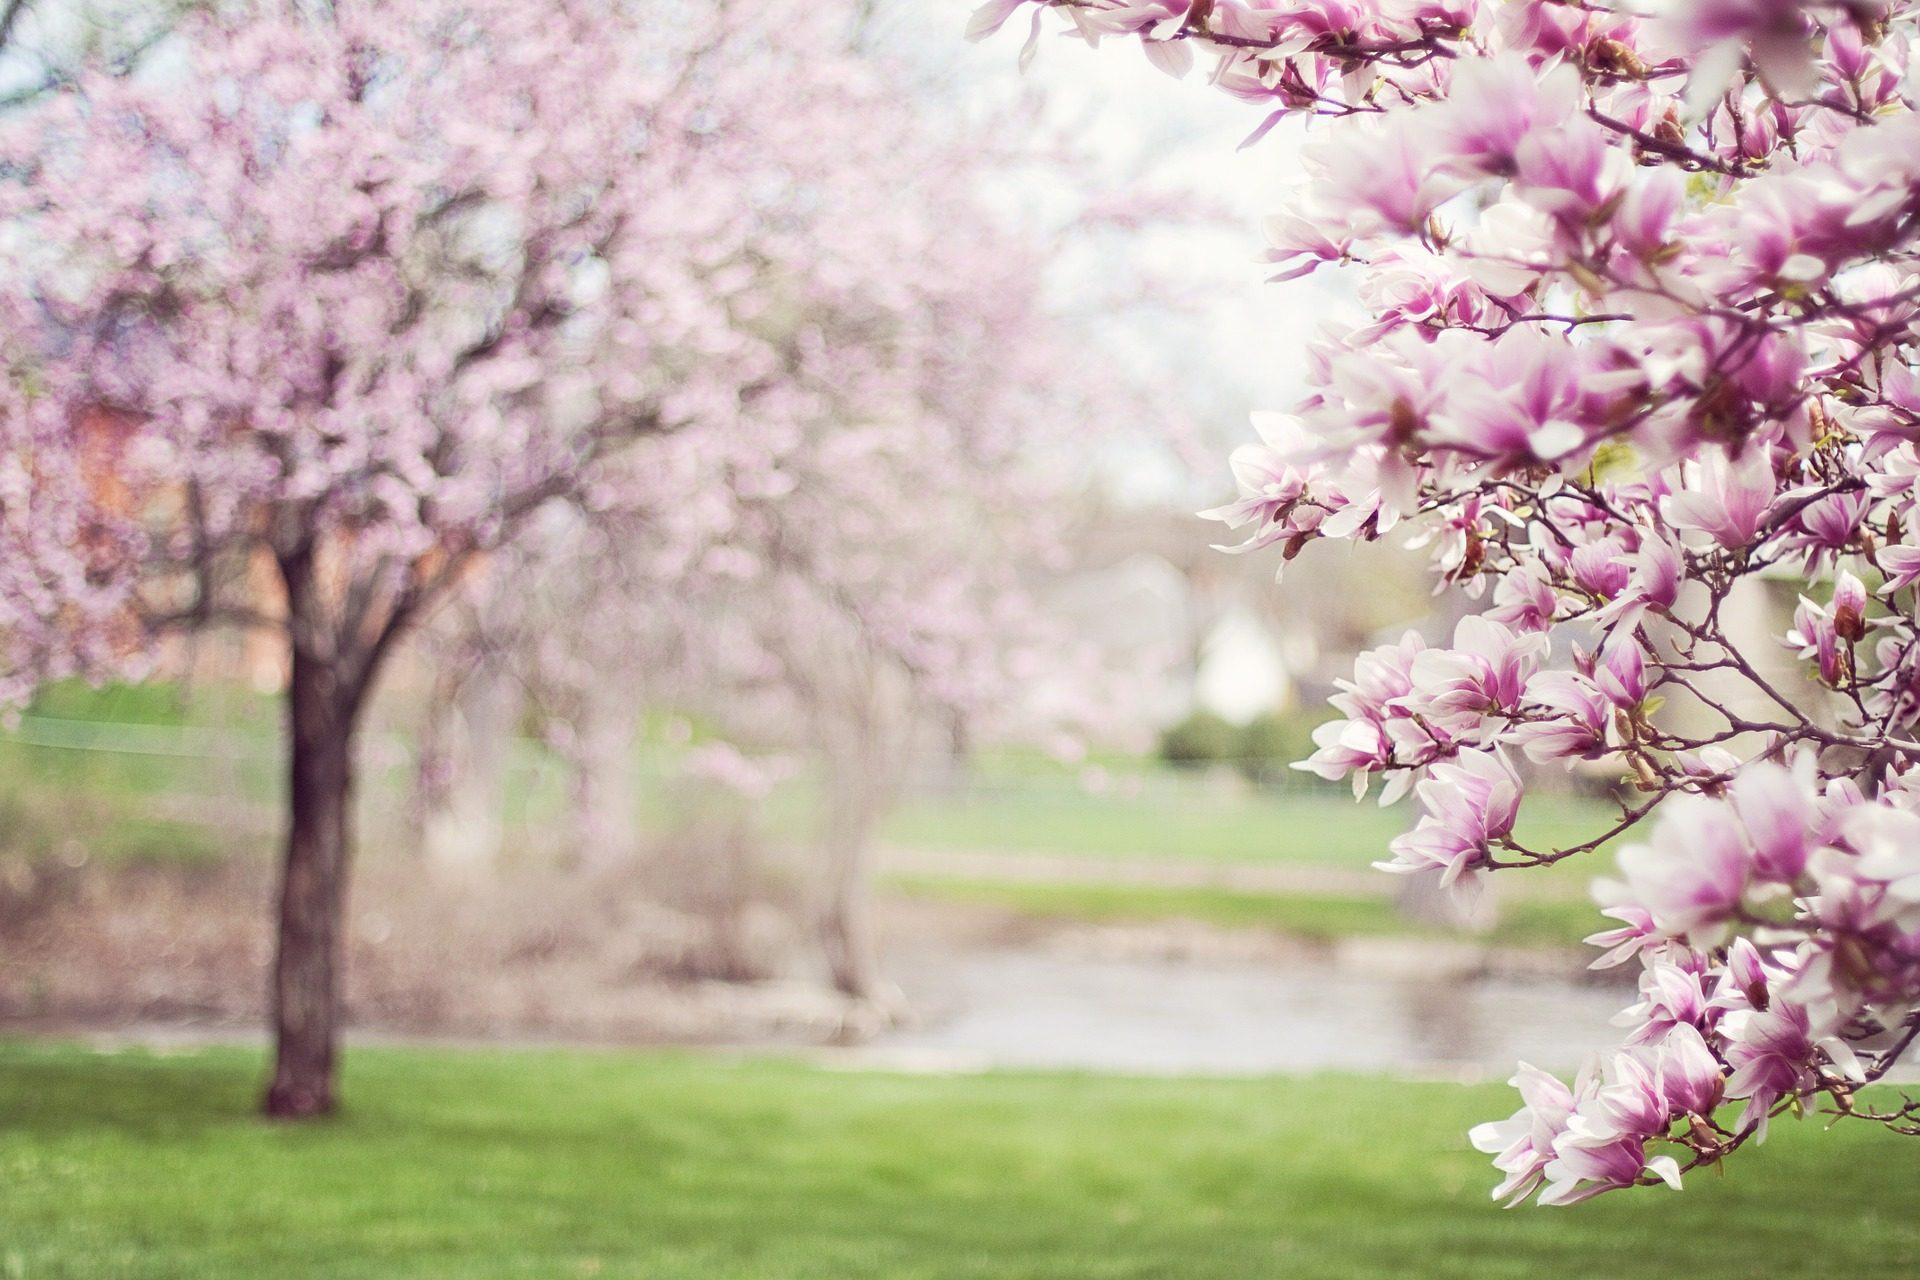 rboles, floración, magnolias, वसंत, रोजा - HD वॉलपेपर - प्रोफेसर-falken.com